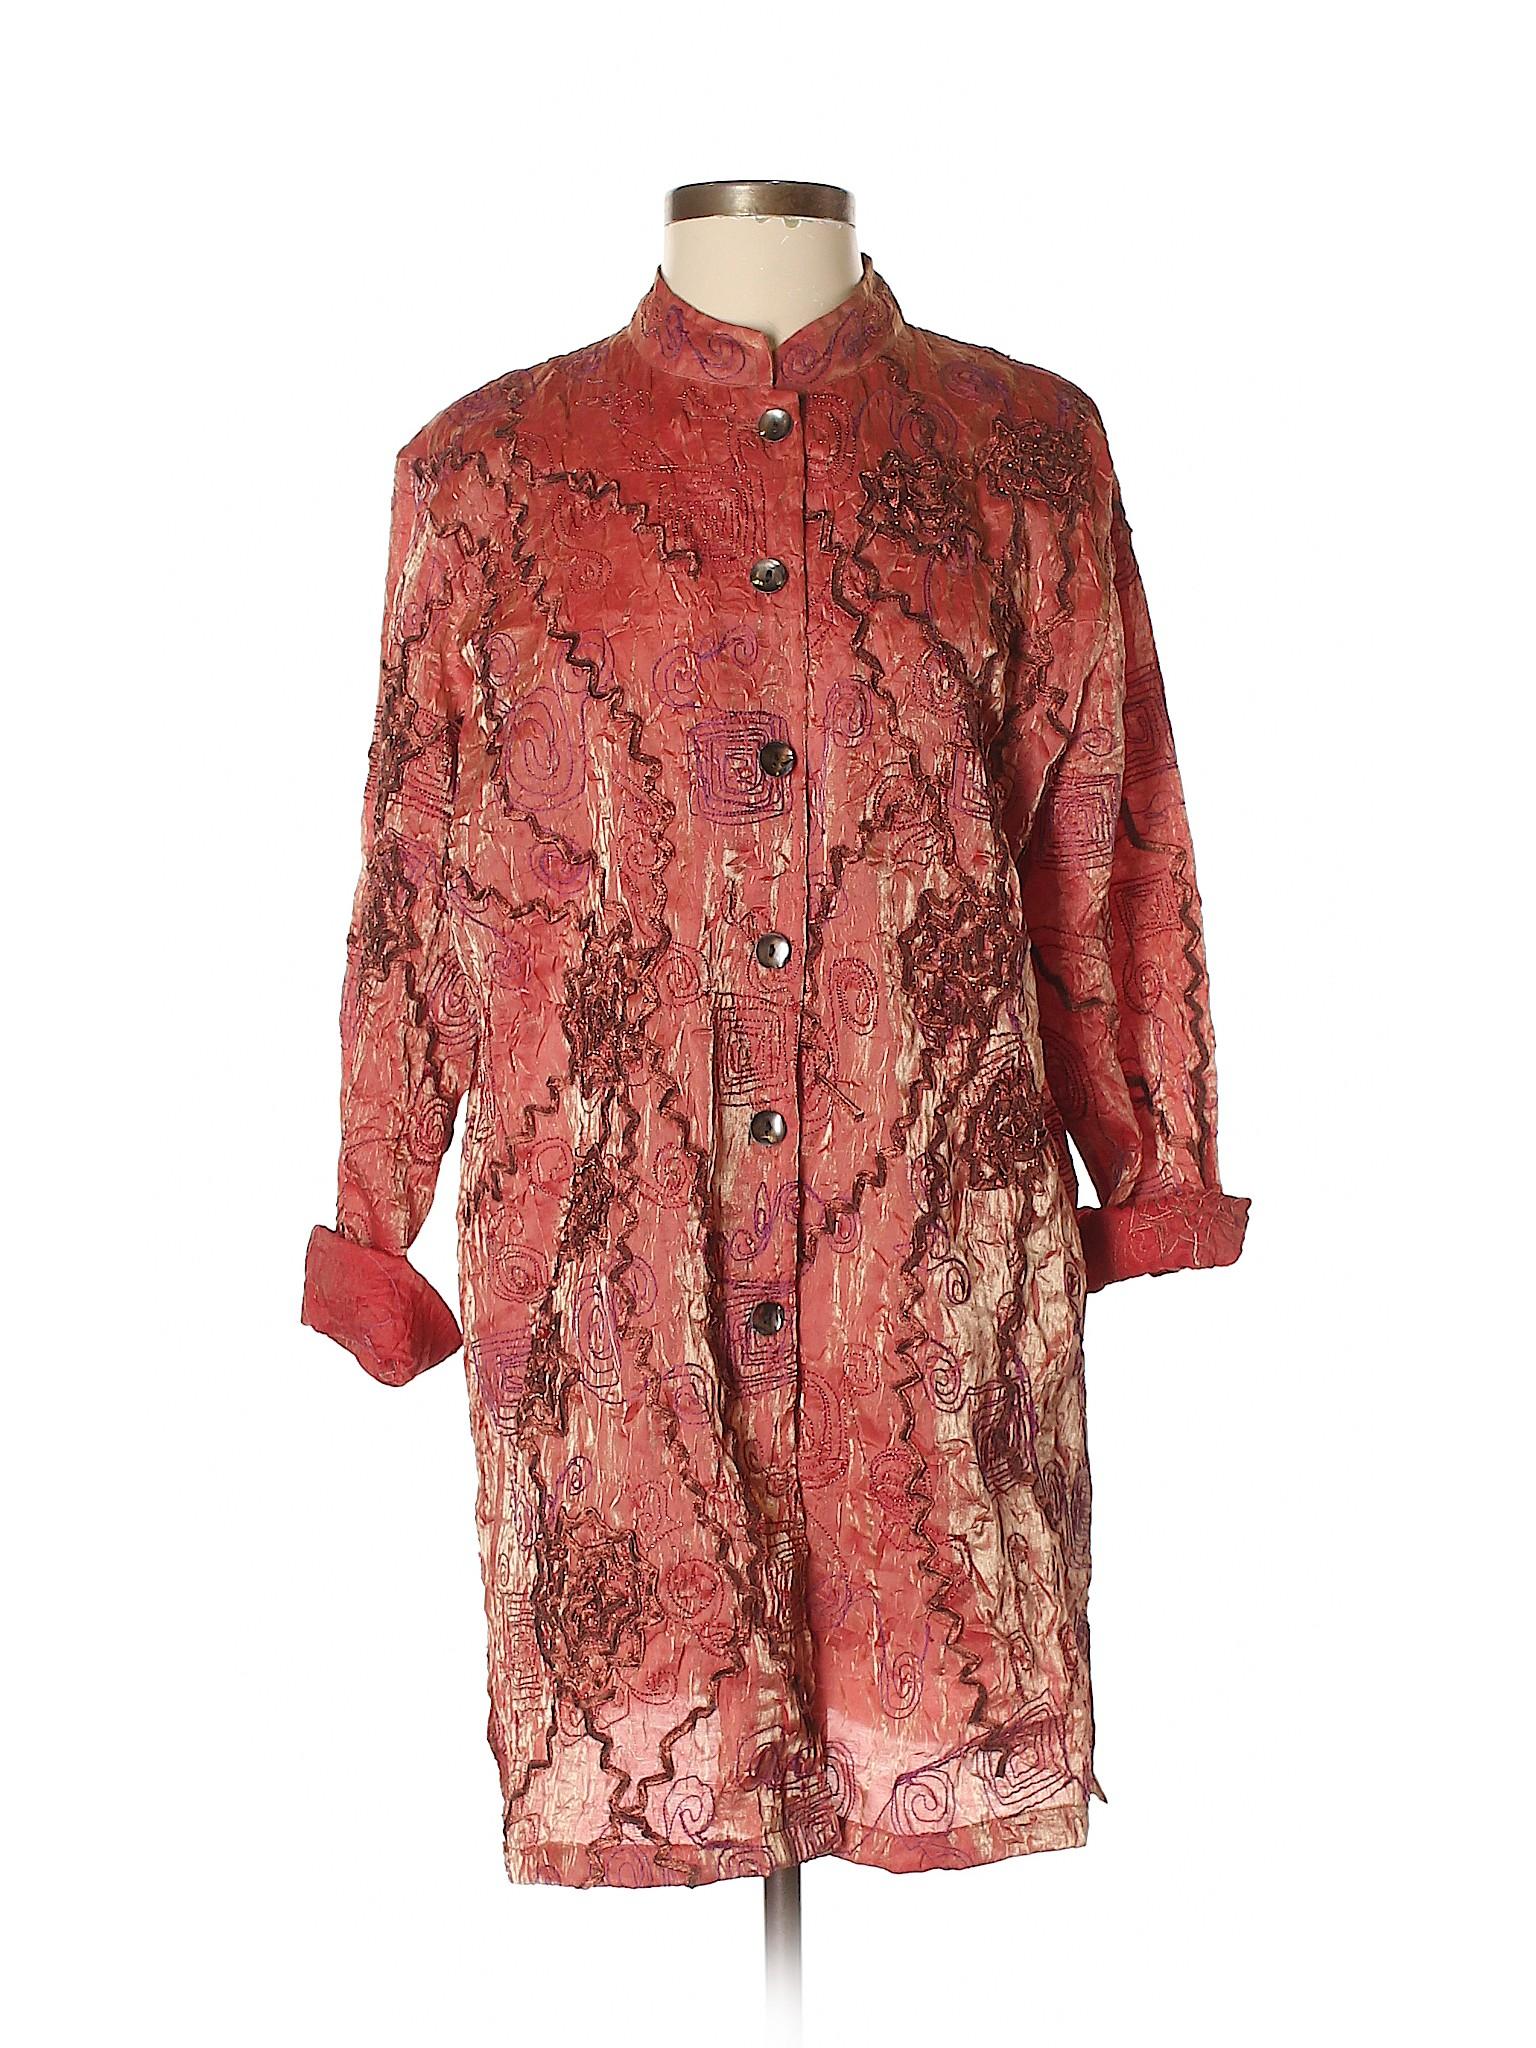 Moon Jacket Indigo Boutique Indigo Moon Boutique Jacket Indigo Boutique Moon Jacket Indigo Boutique q0pg7S